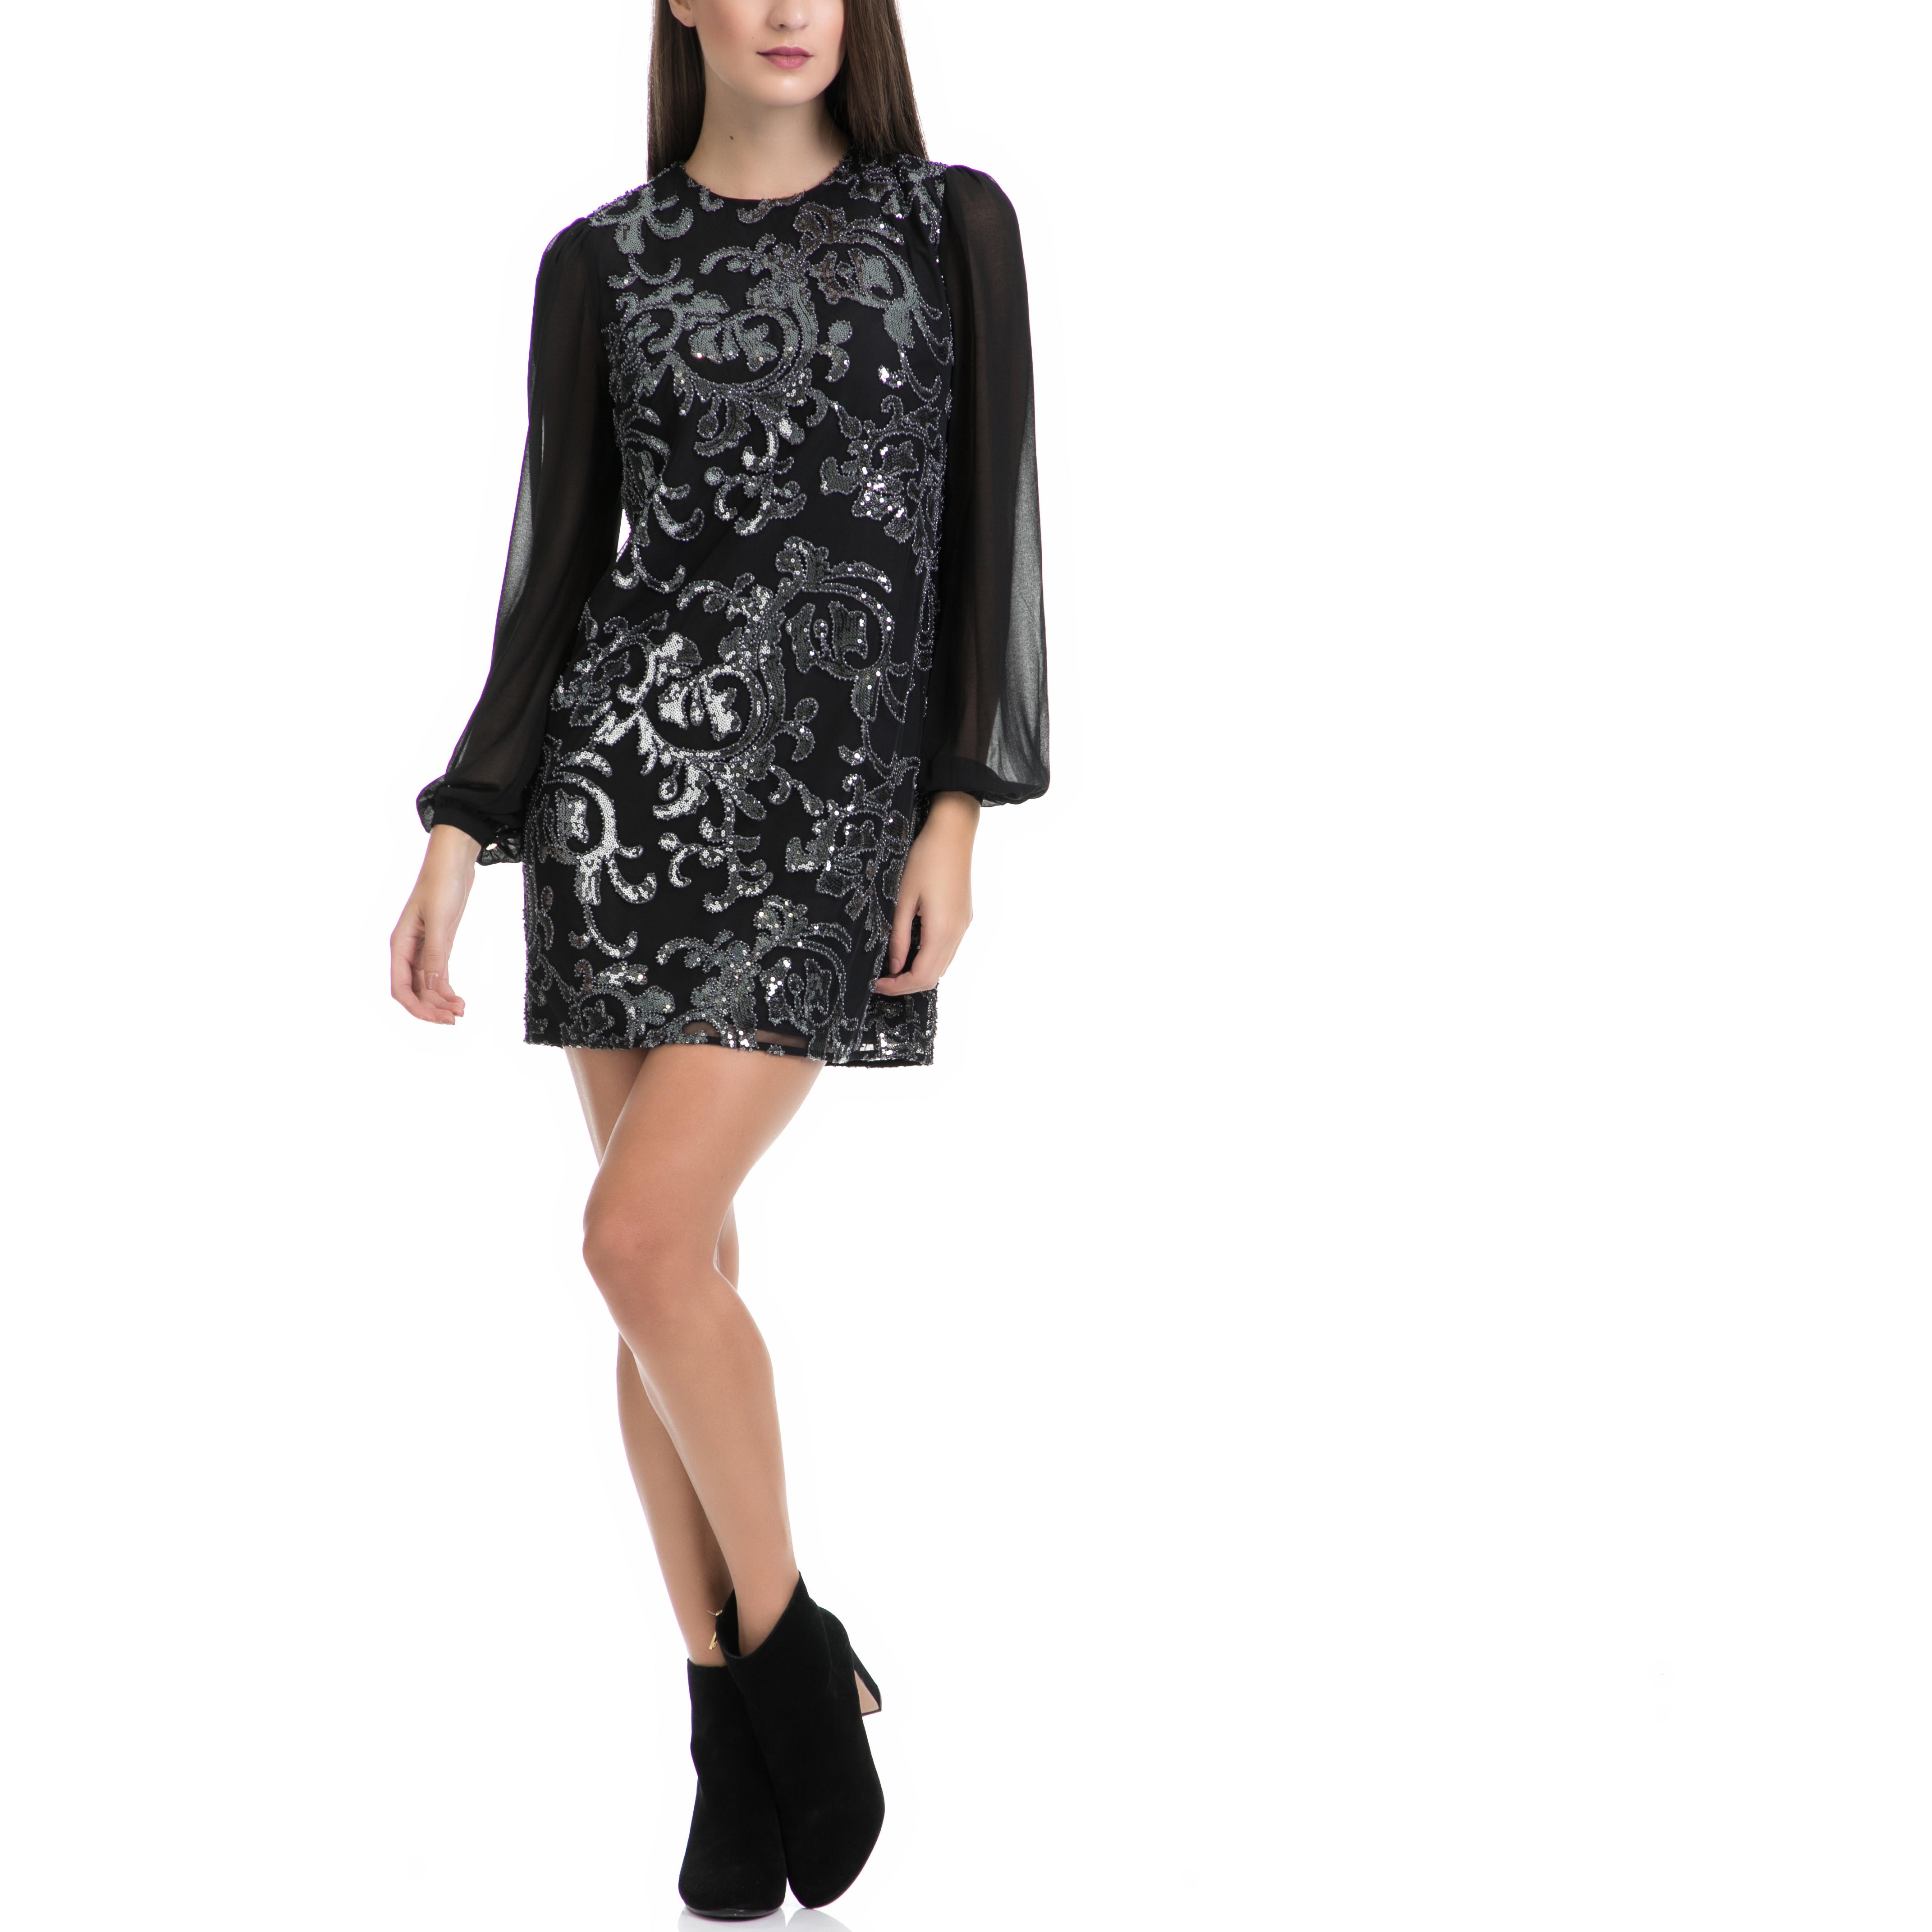 JUICY COUTURE - Γυναικείο φόρεμα MOSCOW SEQUINS μαύρο γυναικεία ρούχα φορέματα μίνι